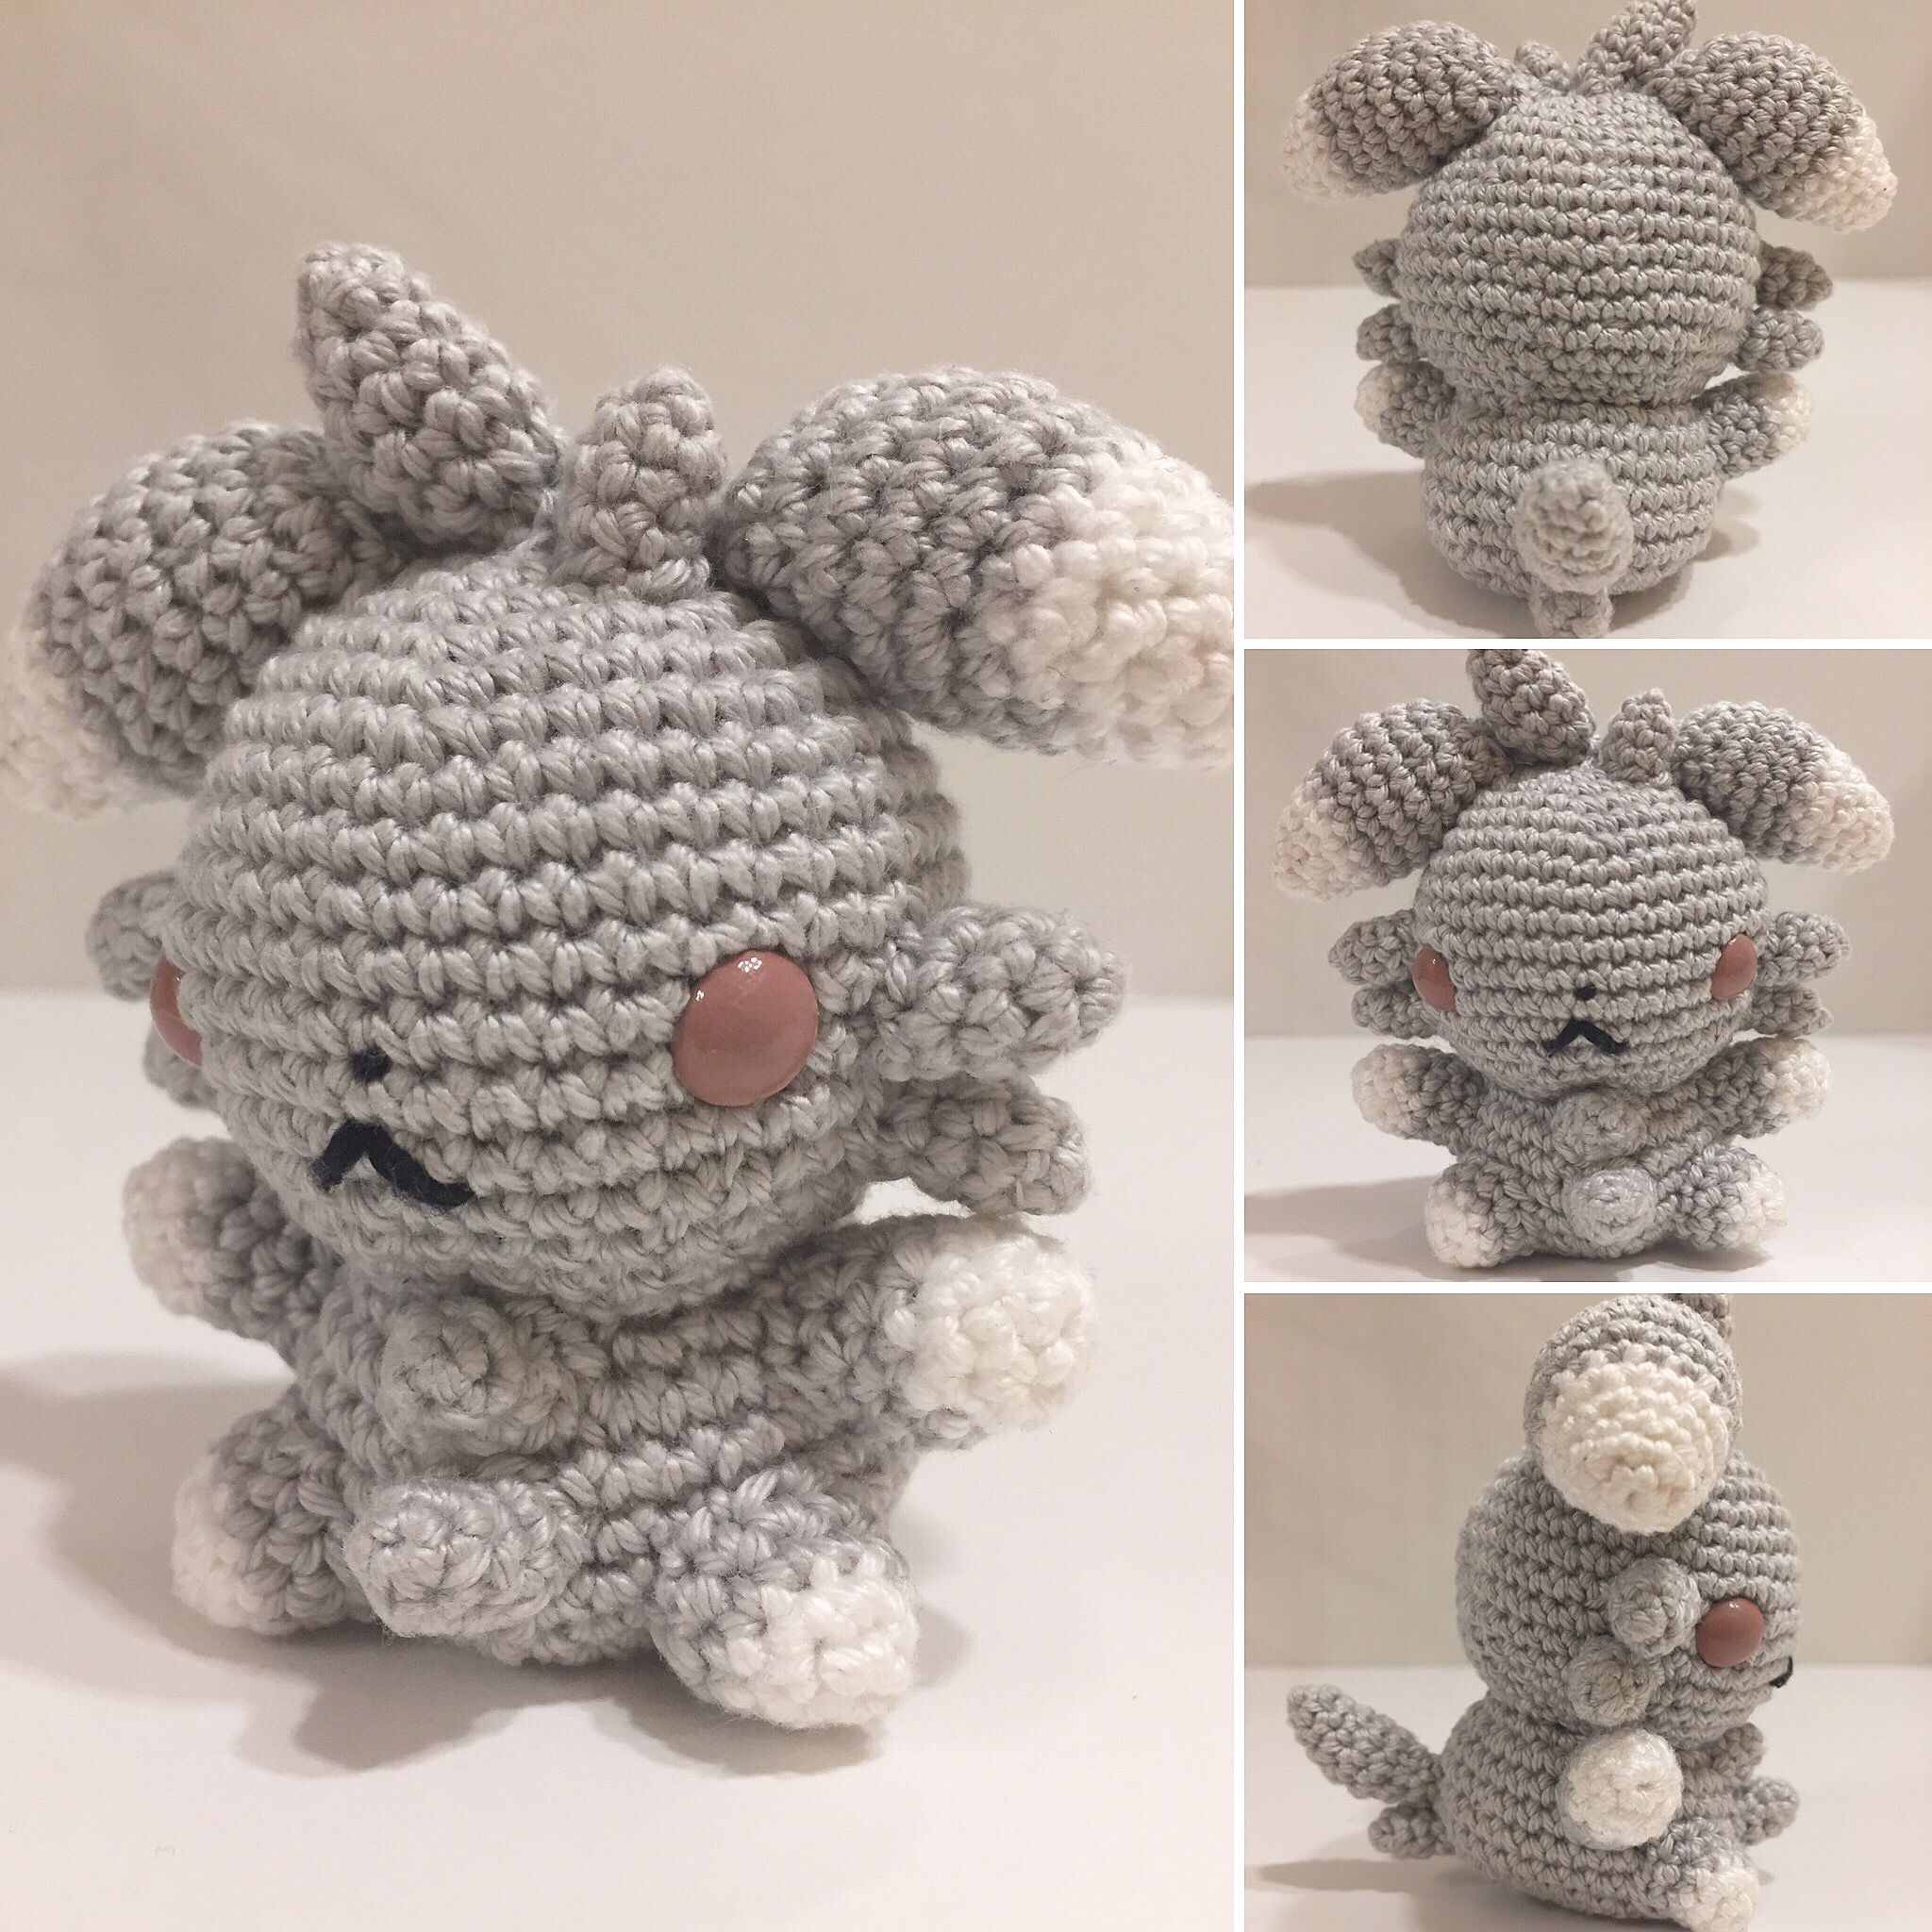 Psiau / Espurr häkeln / crochet | Crochet | Pinterest | Selfmade